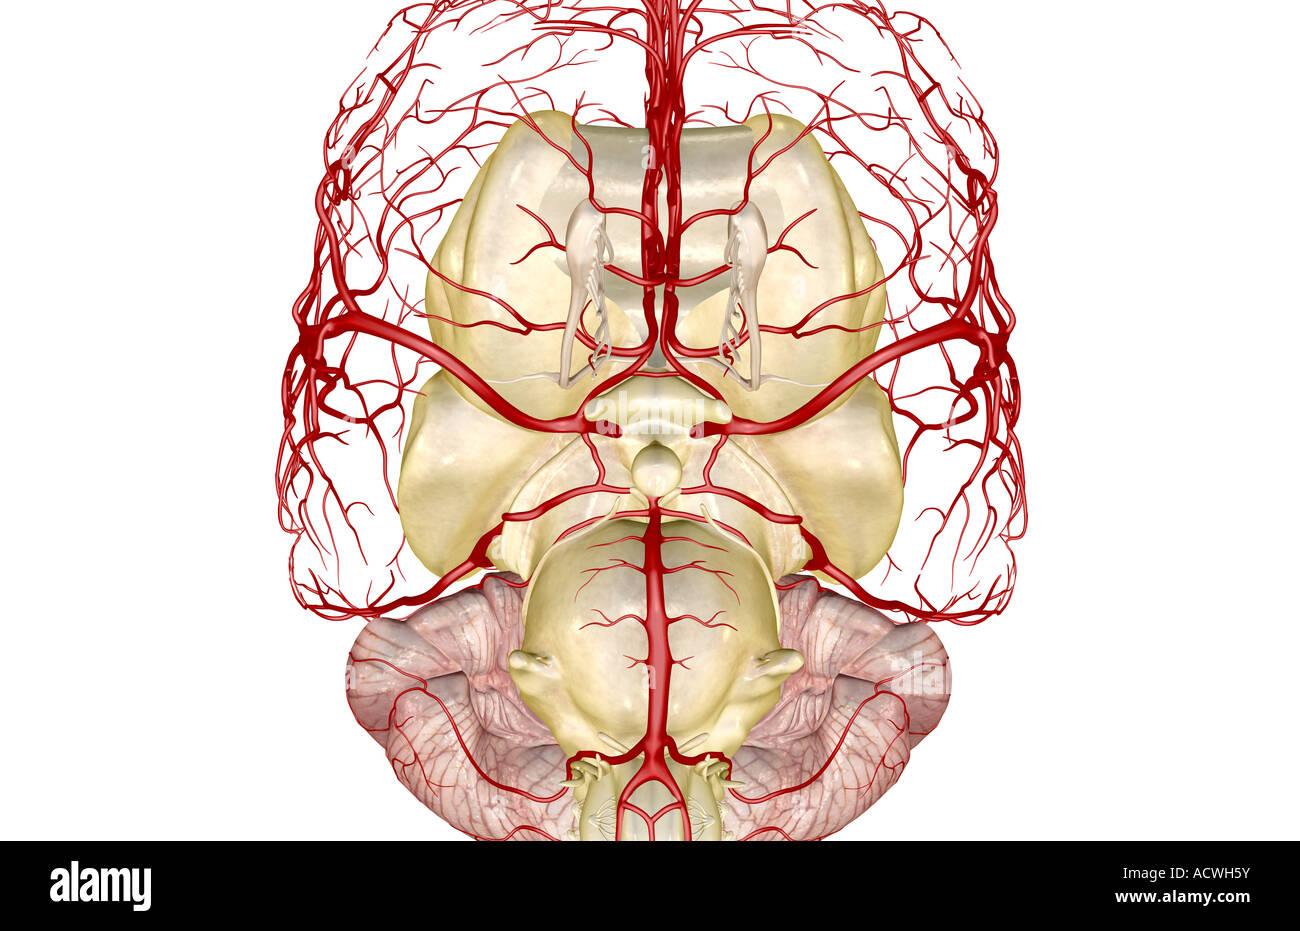 Illustration Circle Willis Circle Arteries Imágenes De Stock ...